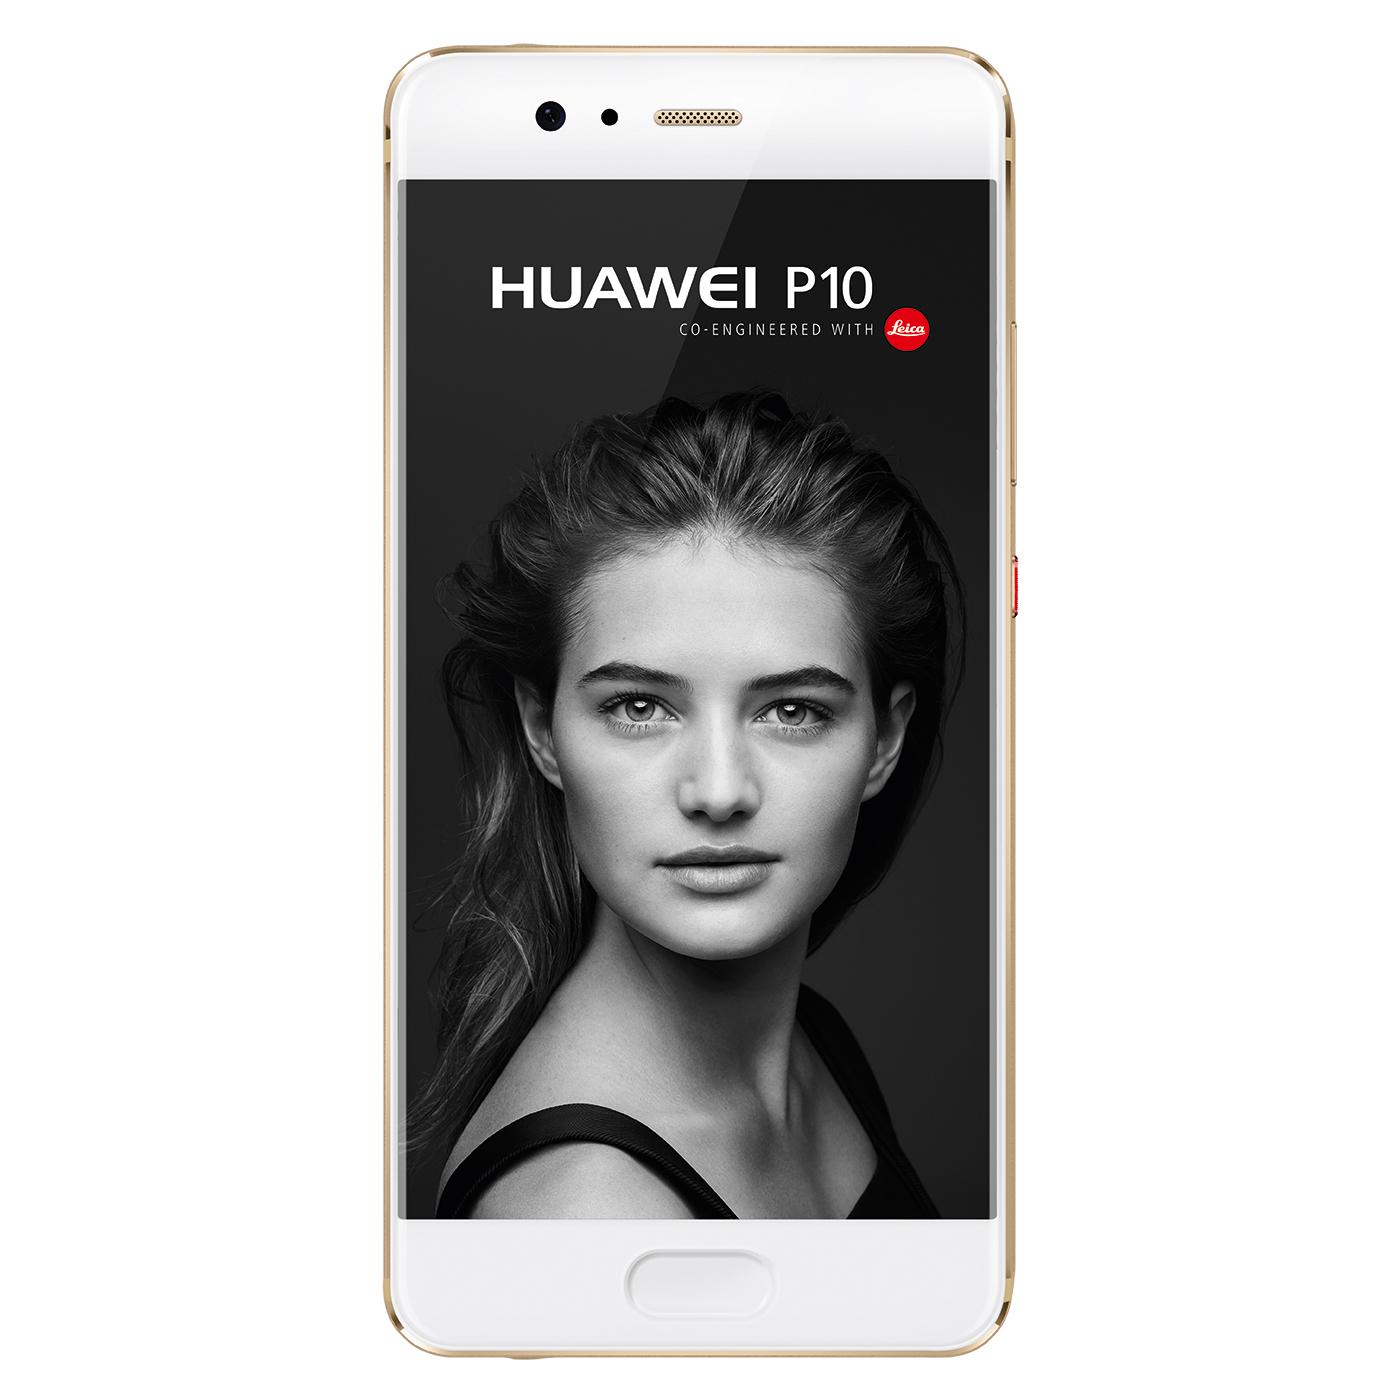 "HUAWEI P10 - 5,1"" Full HD Smartphone (1920x1080, 64 GB, 4GB RAM, 20/12/8MP, Single SIM, 3200 mAh, Android 8) in Graphite Black oder Prestige Gold [nbb]"